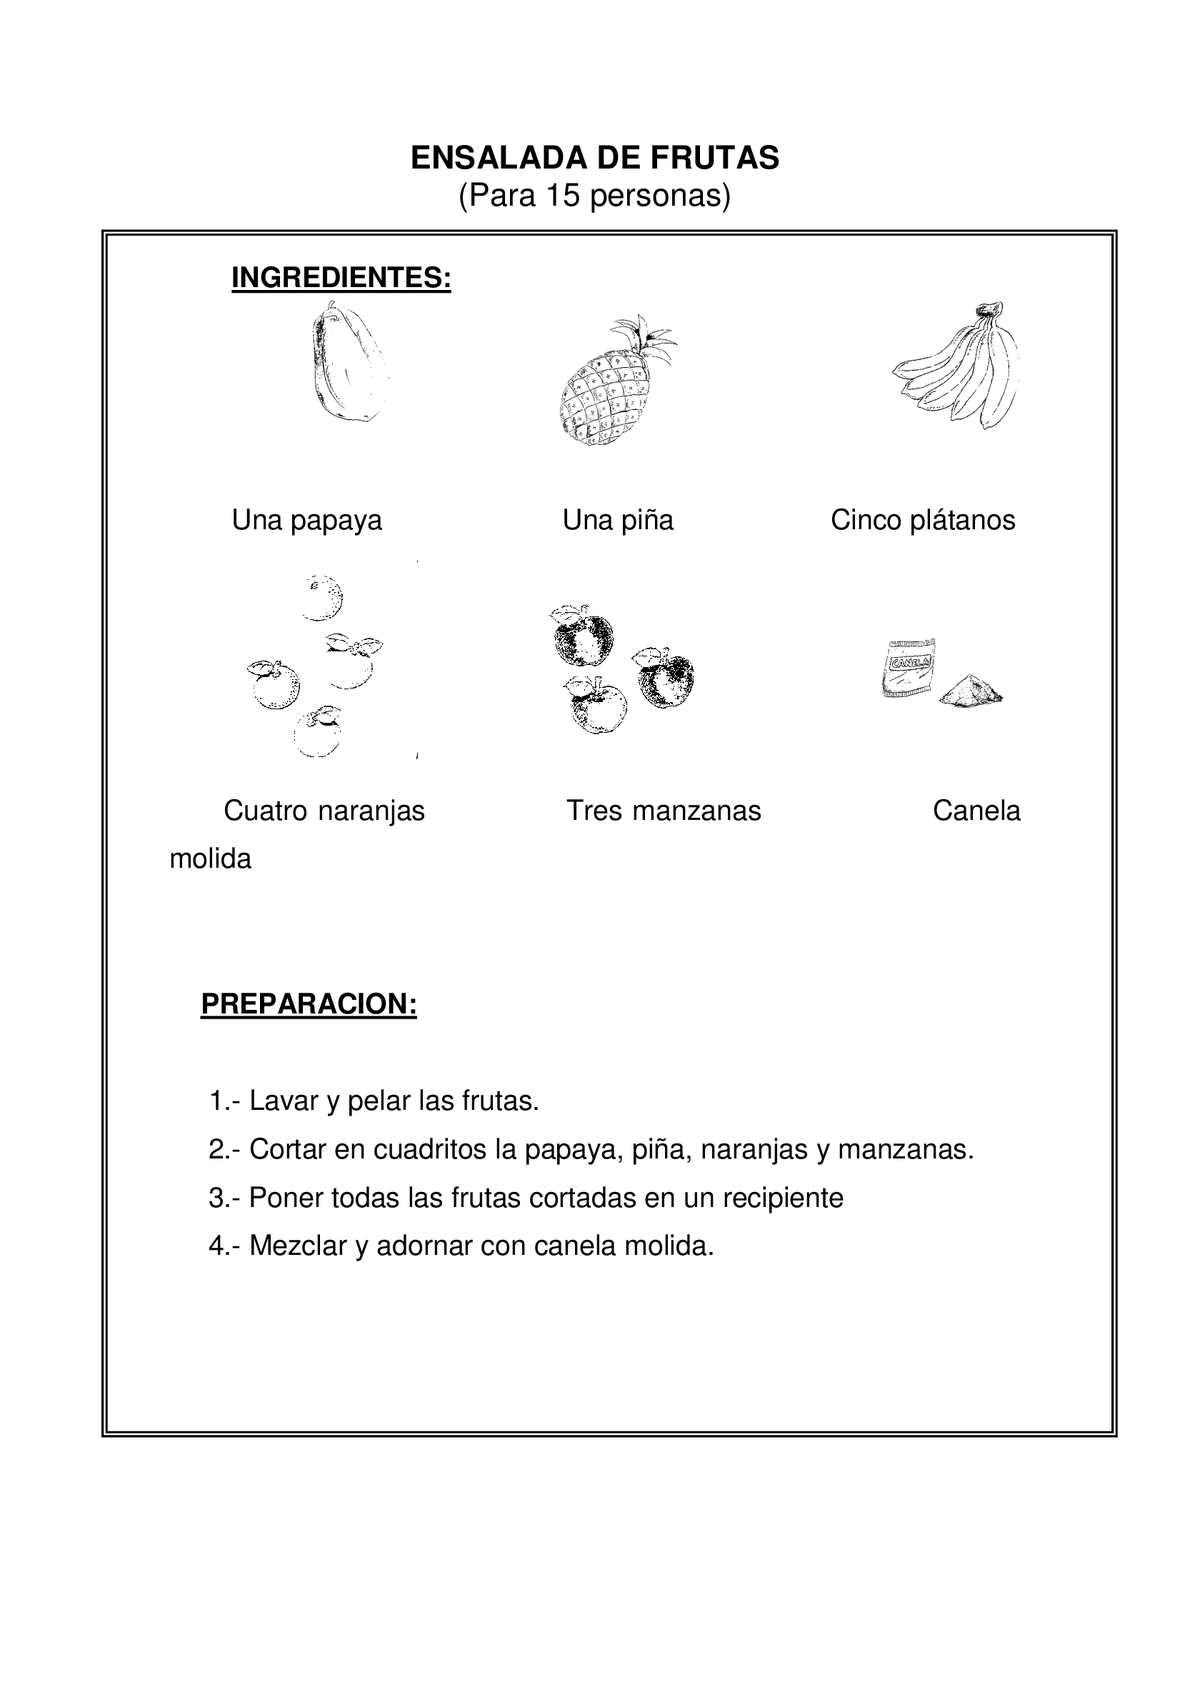 Calaméo - TEXTO INSTRUCTIVO: ENSALADA DE FRUTA